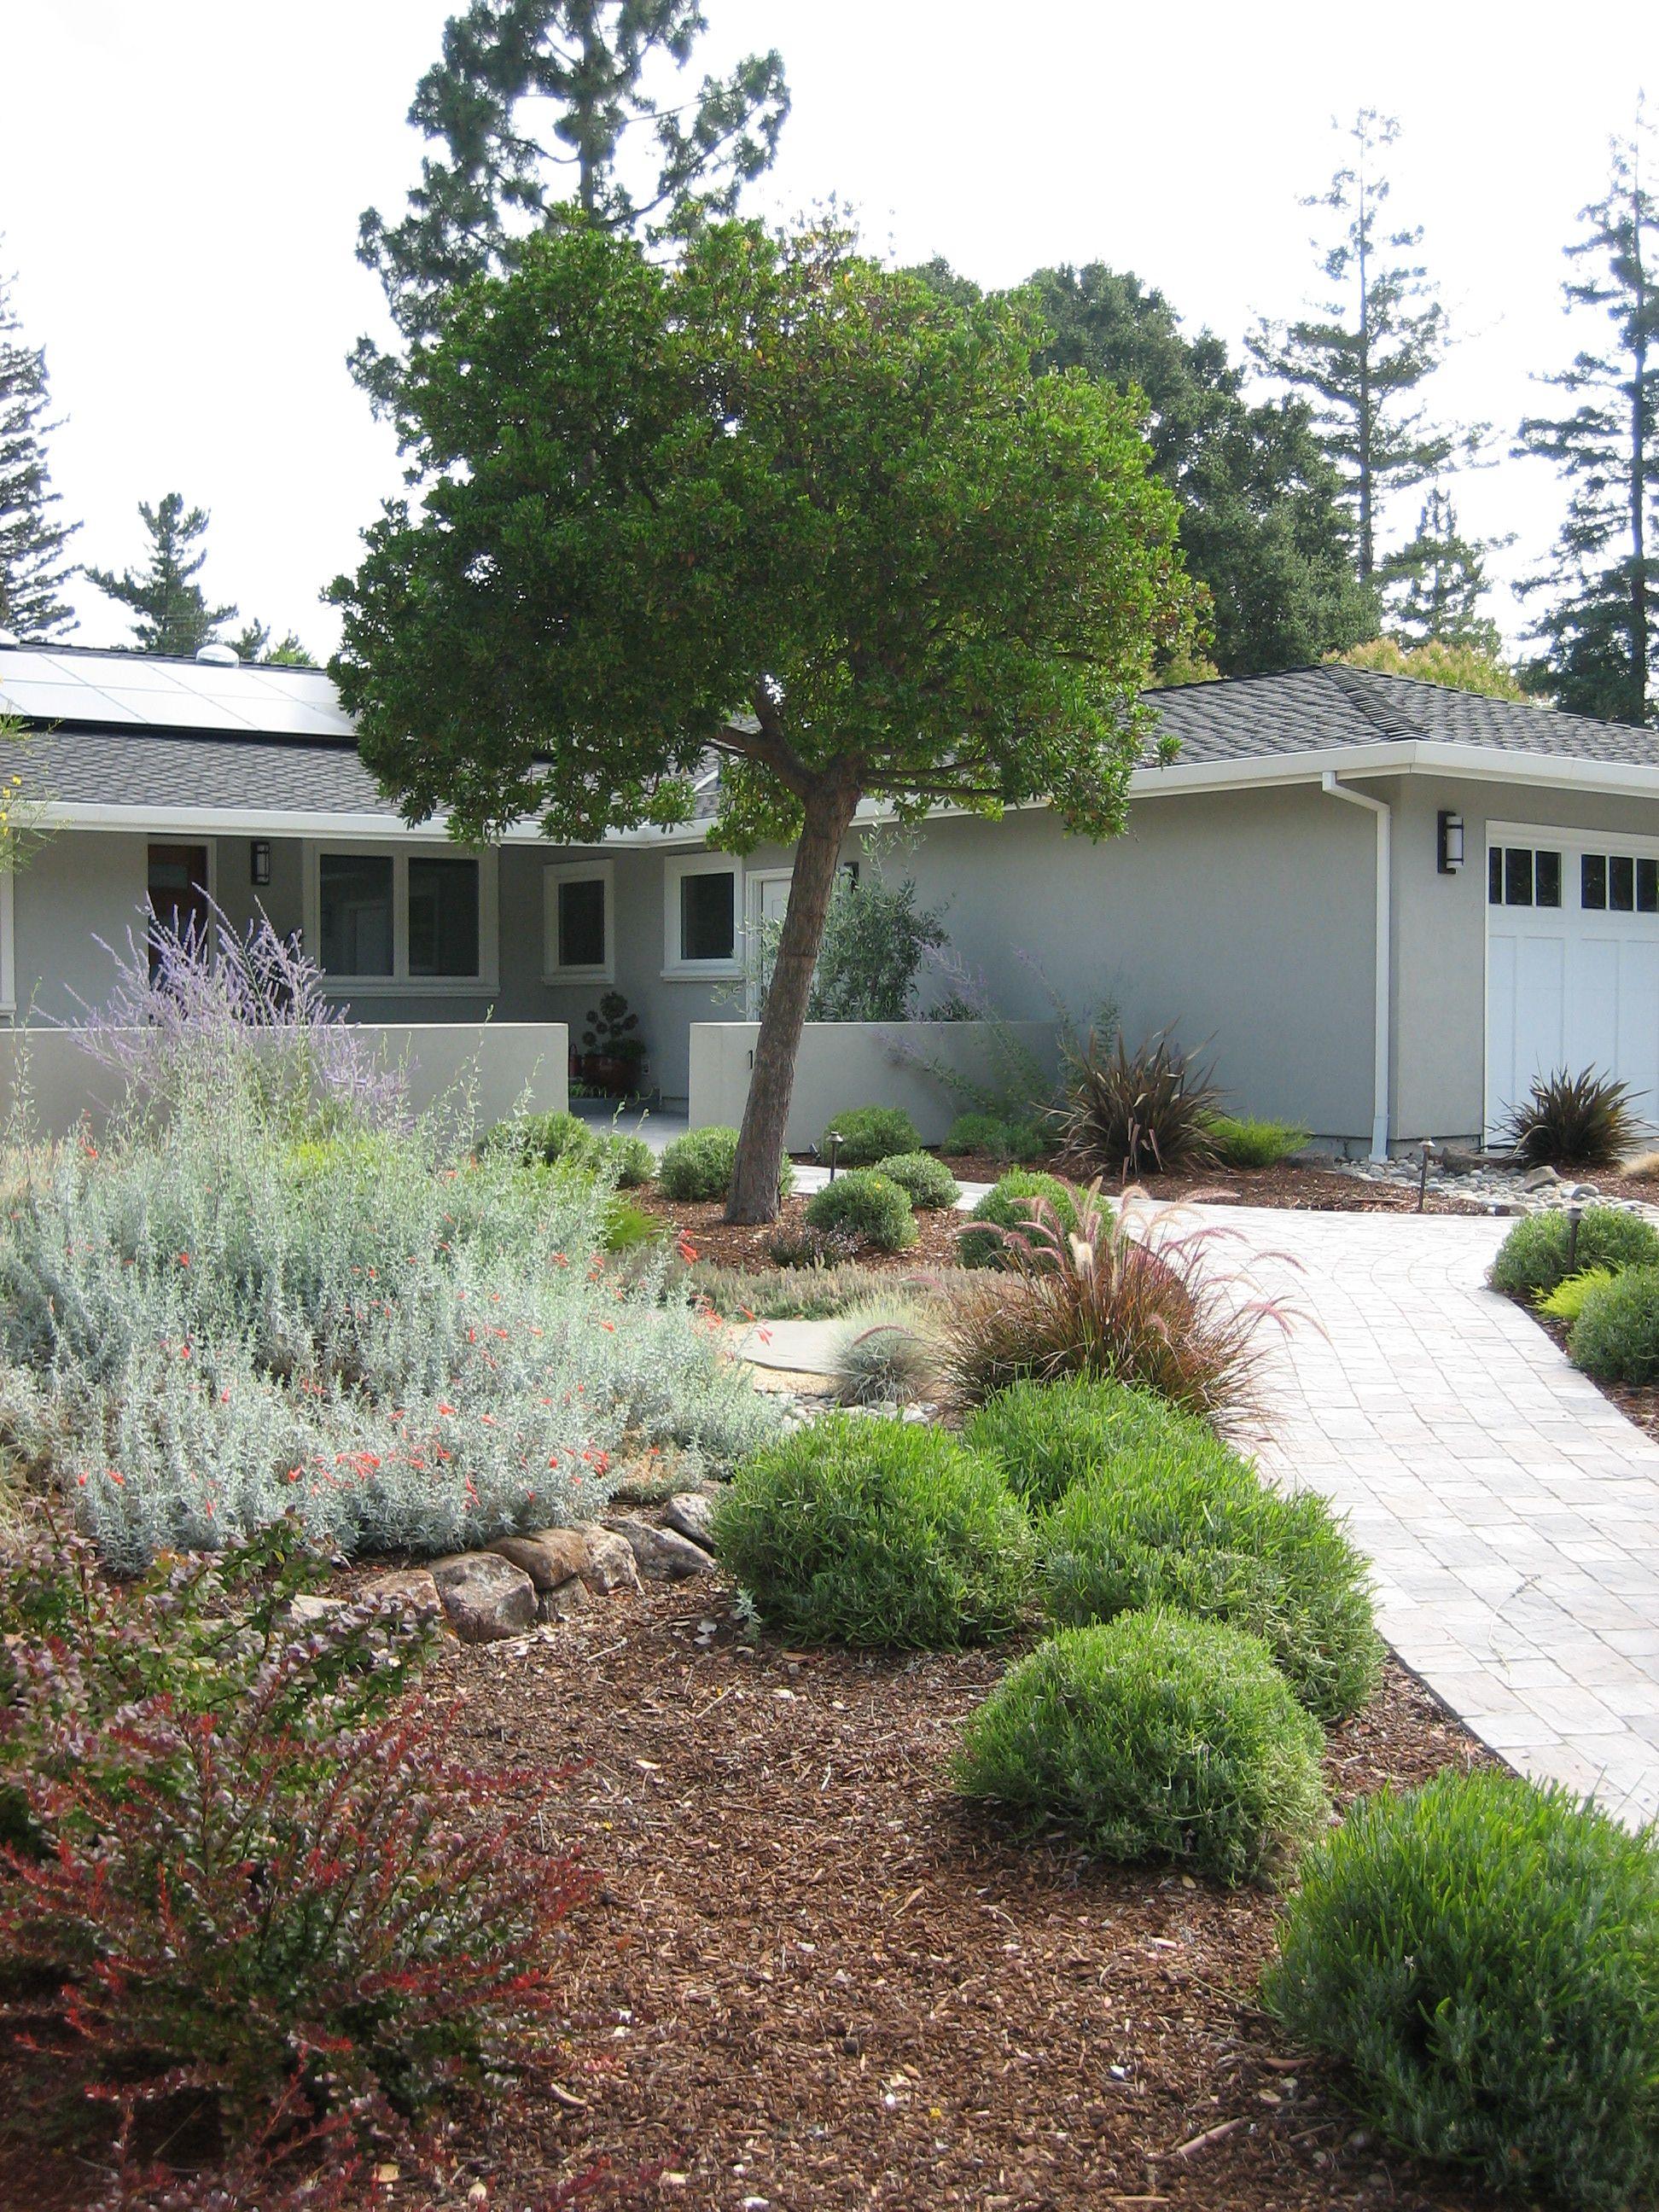 Dorable Olive Garden Palo Alto Ornament  Beautiful Garden